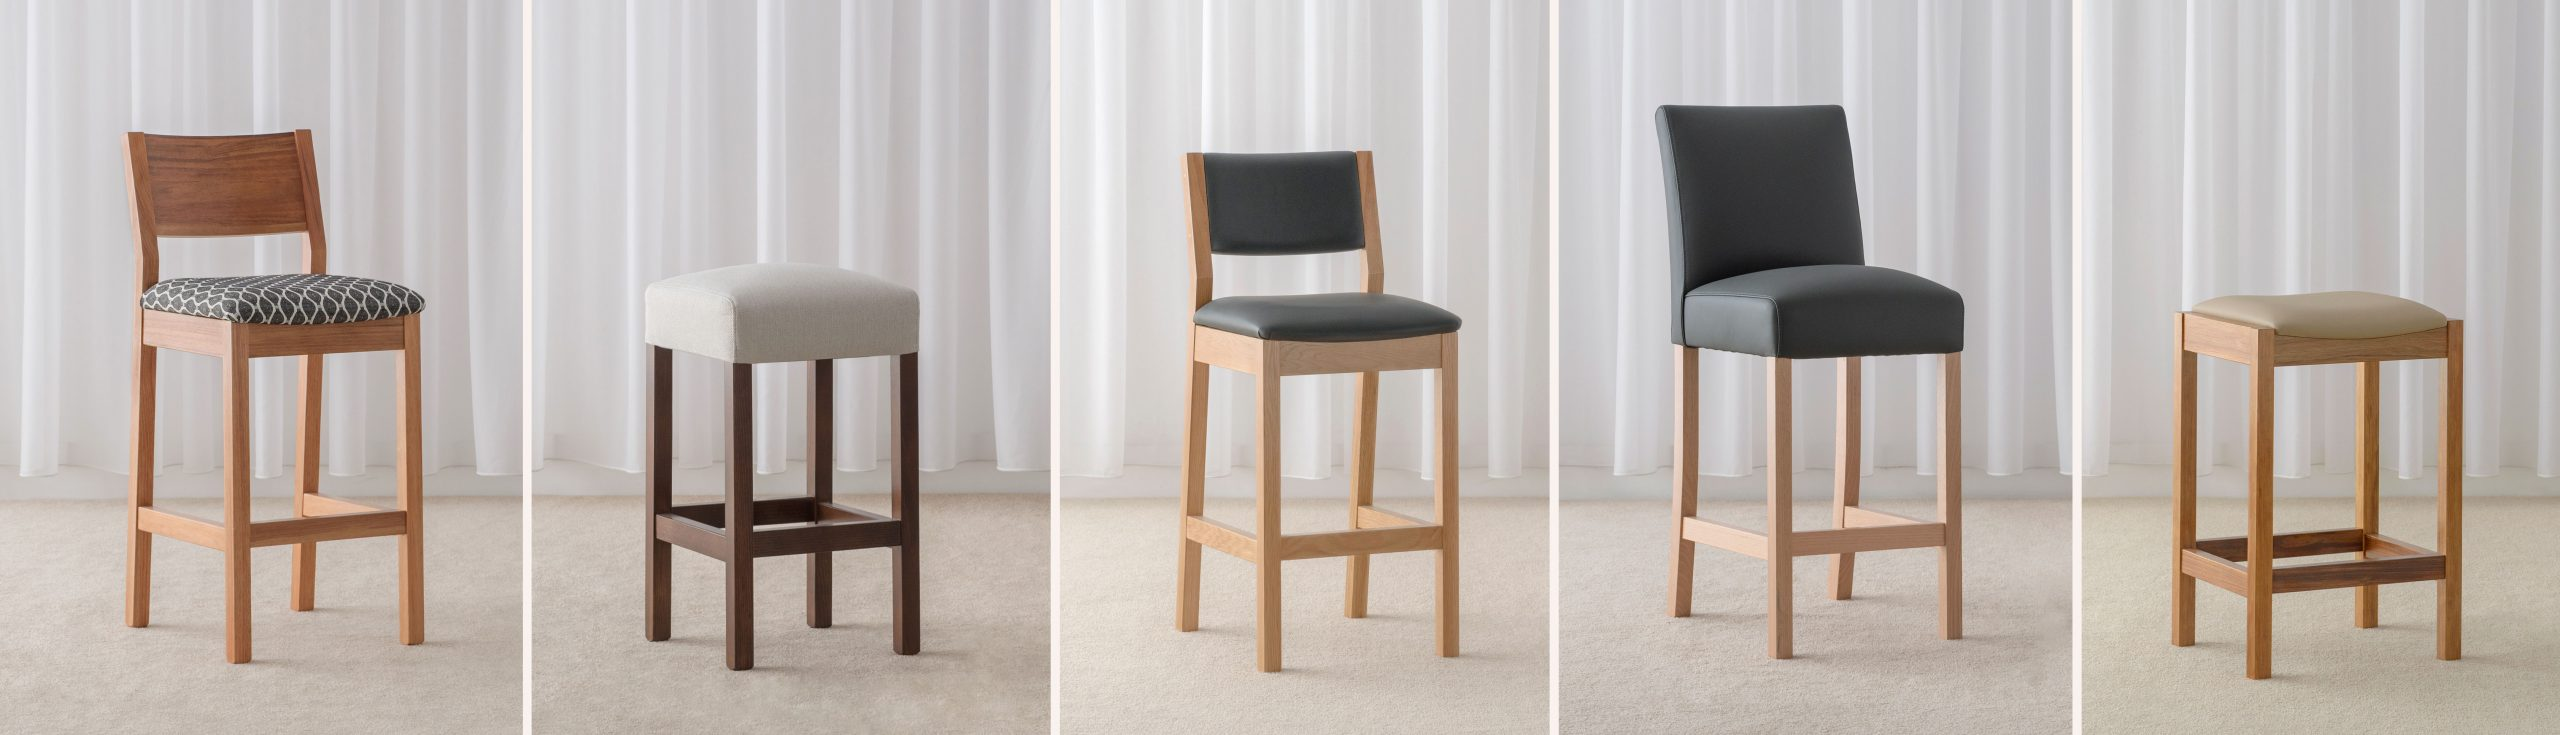 locally made bar stools using hardwood timber